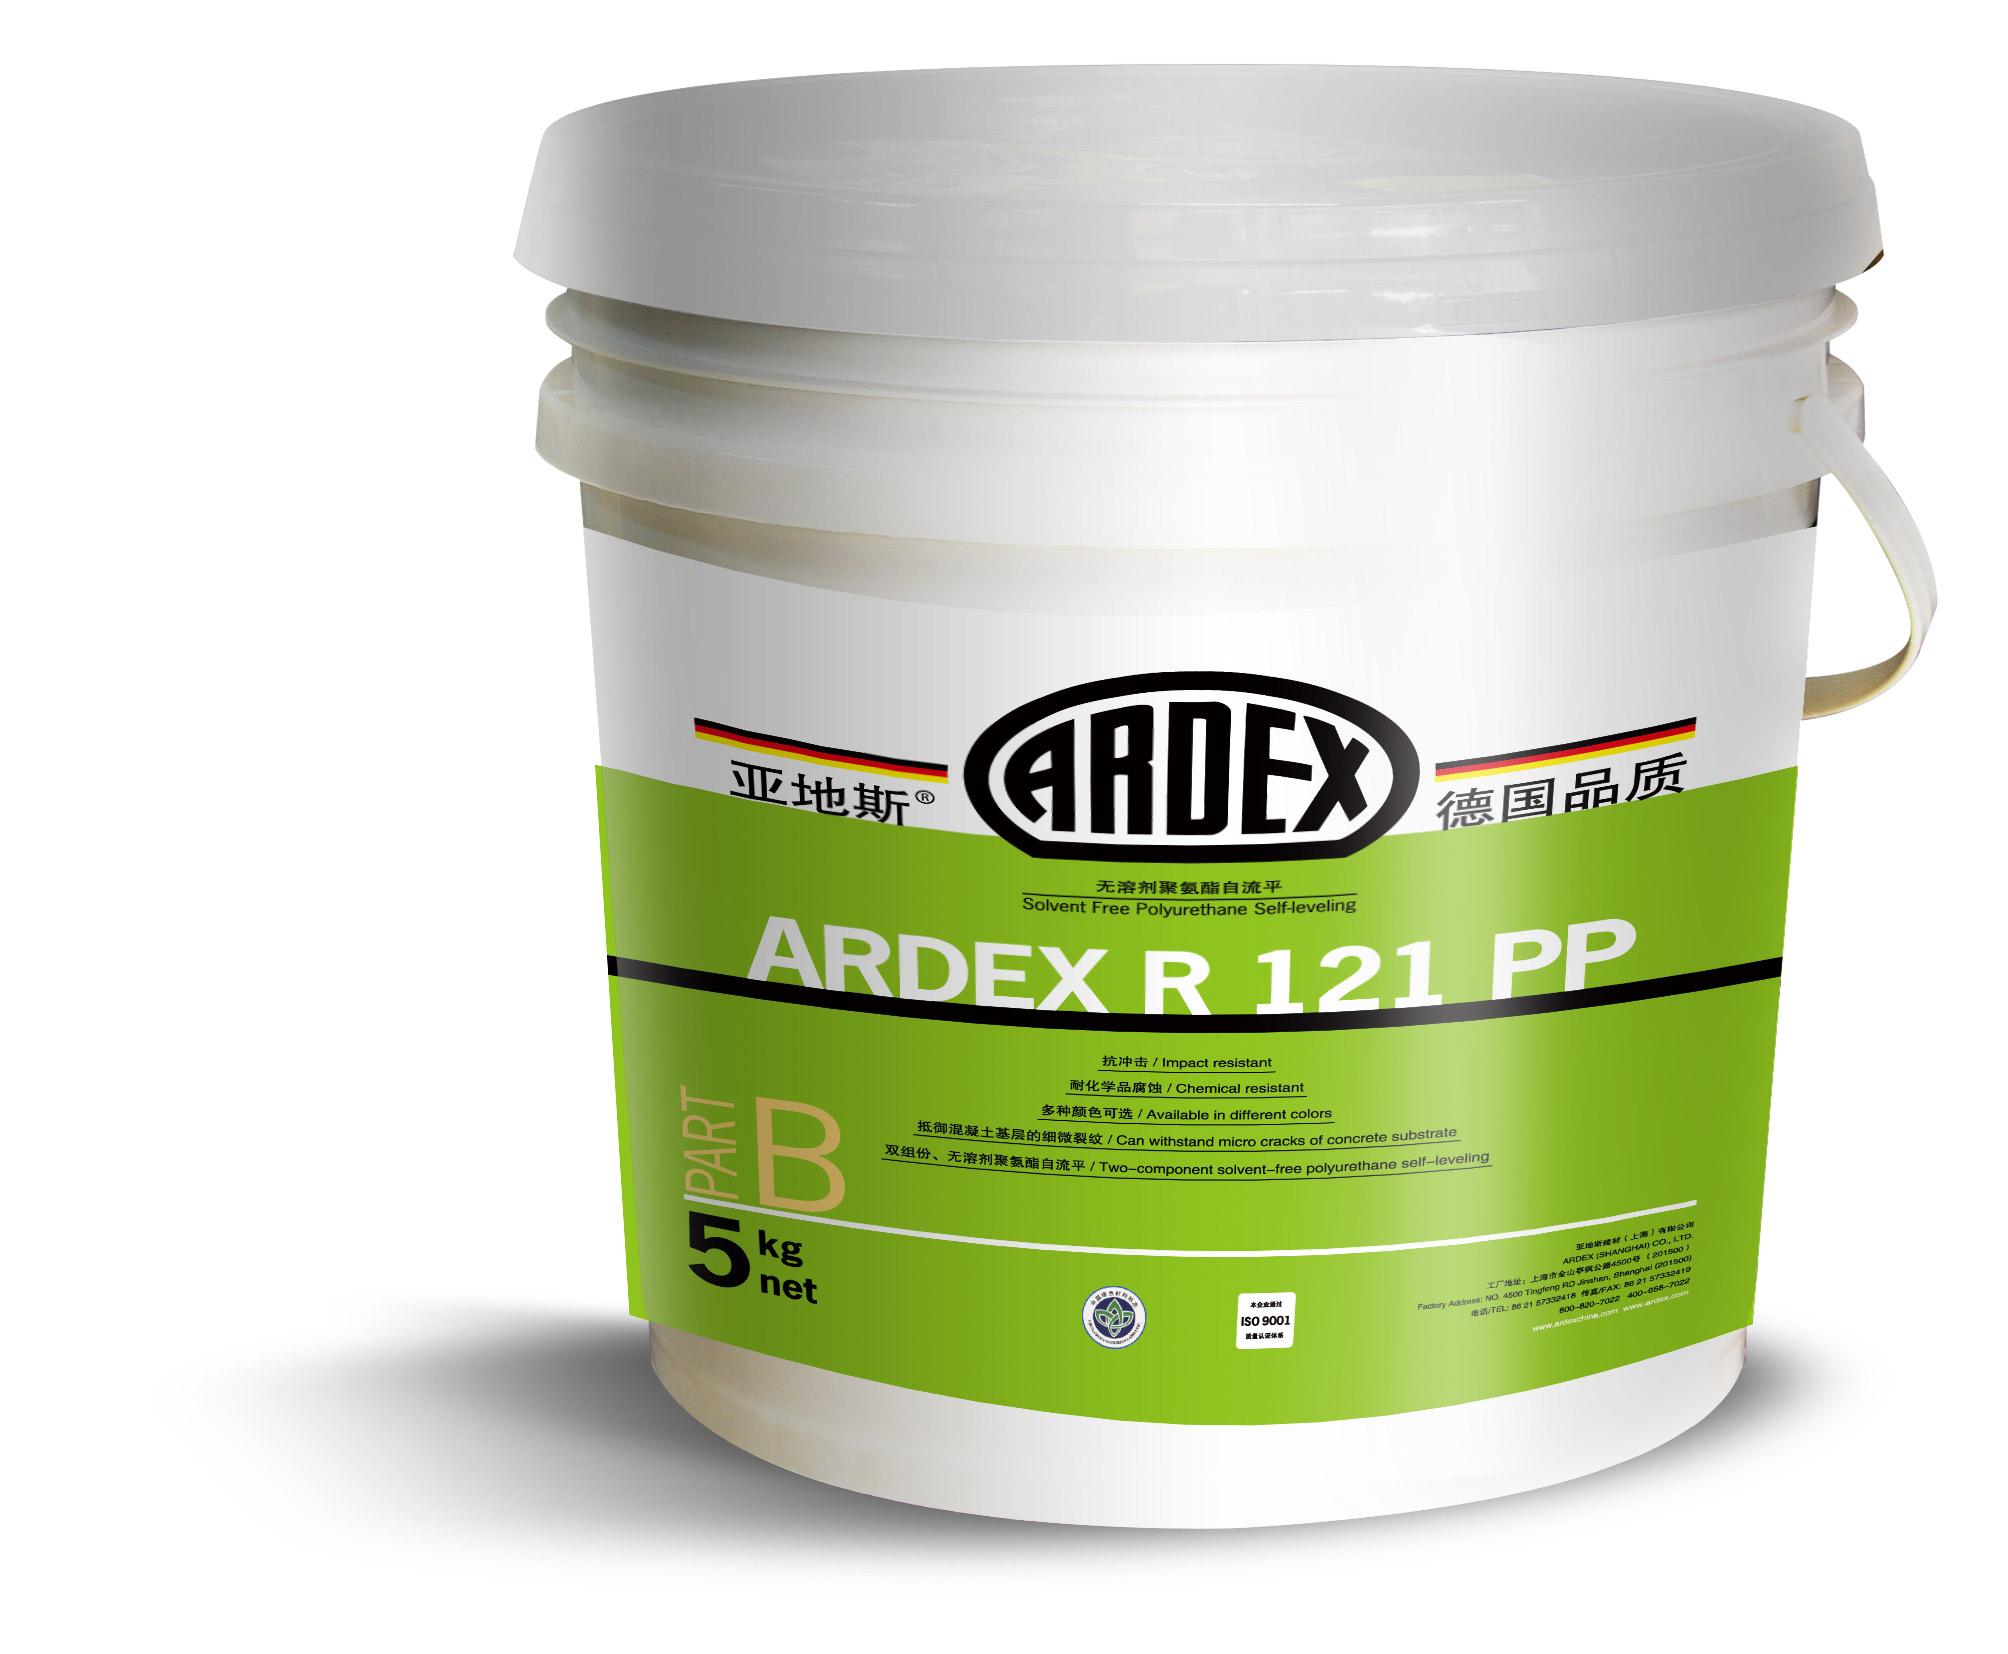 ARDEX R 121 PP